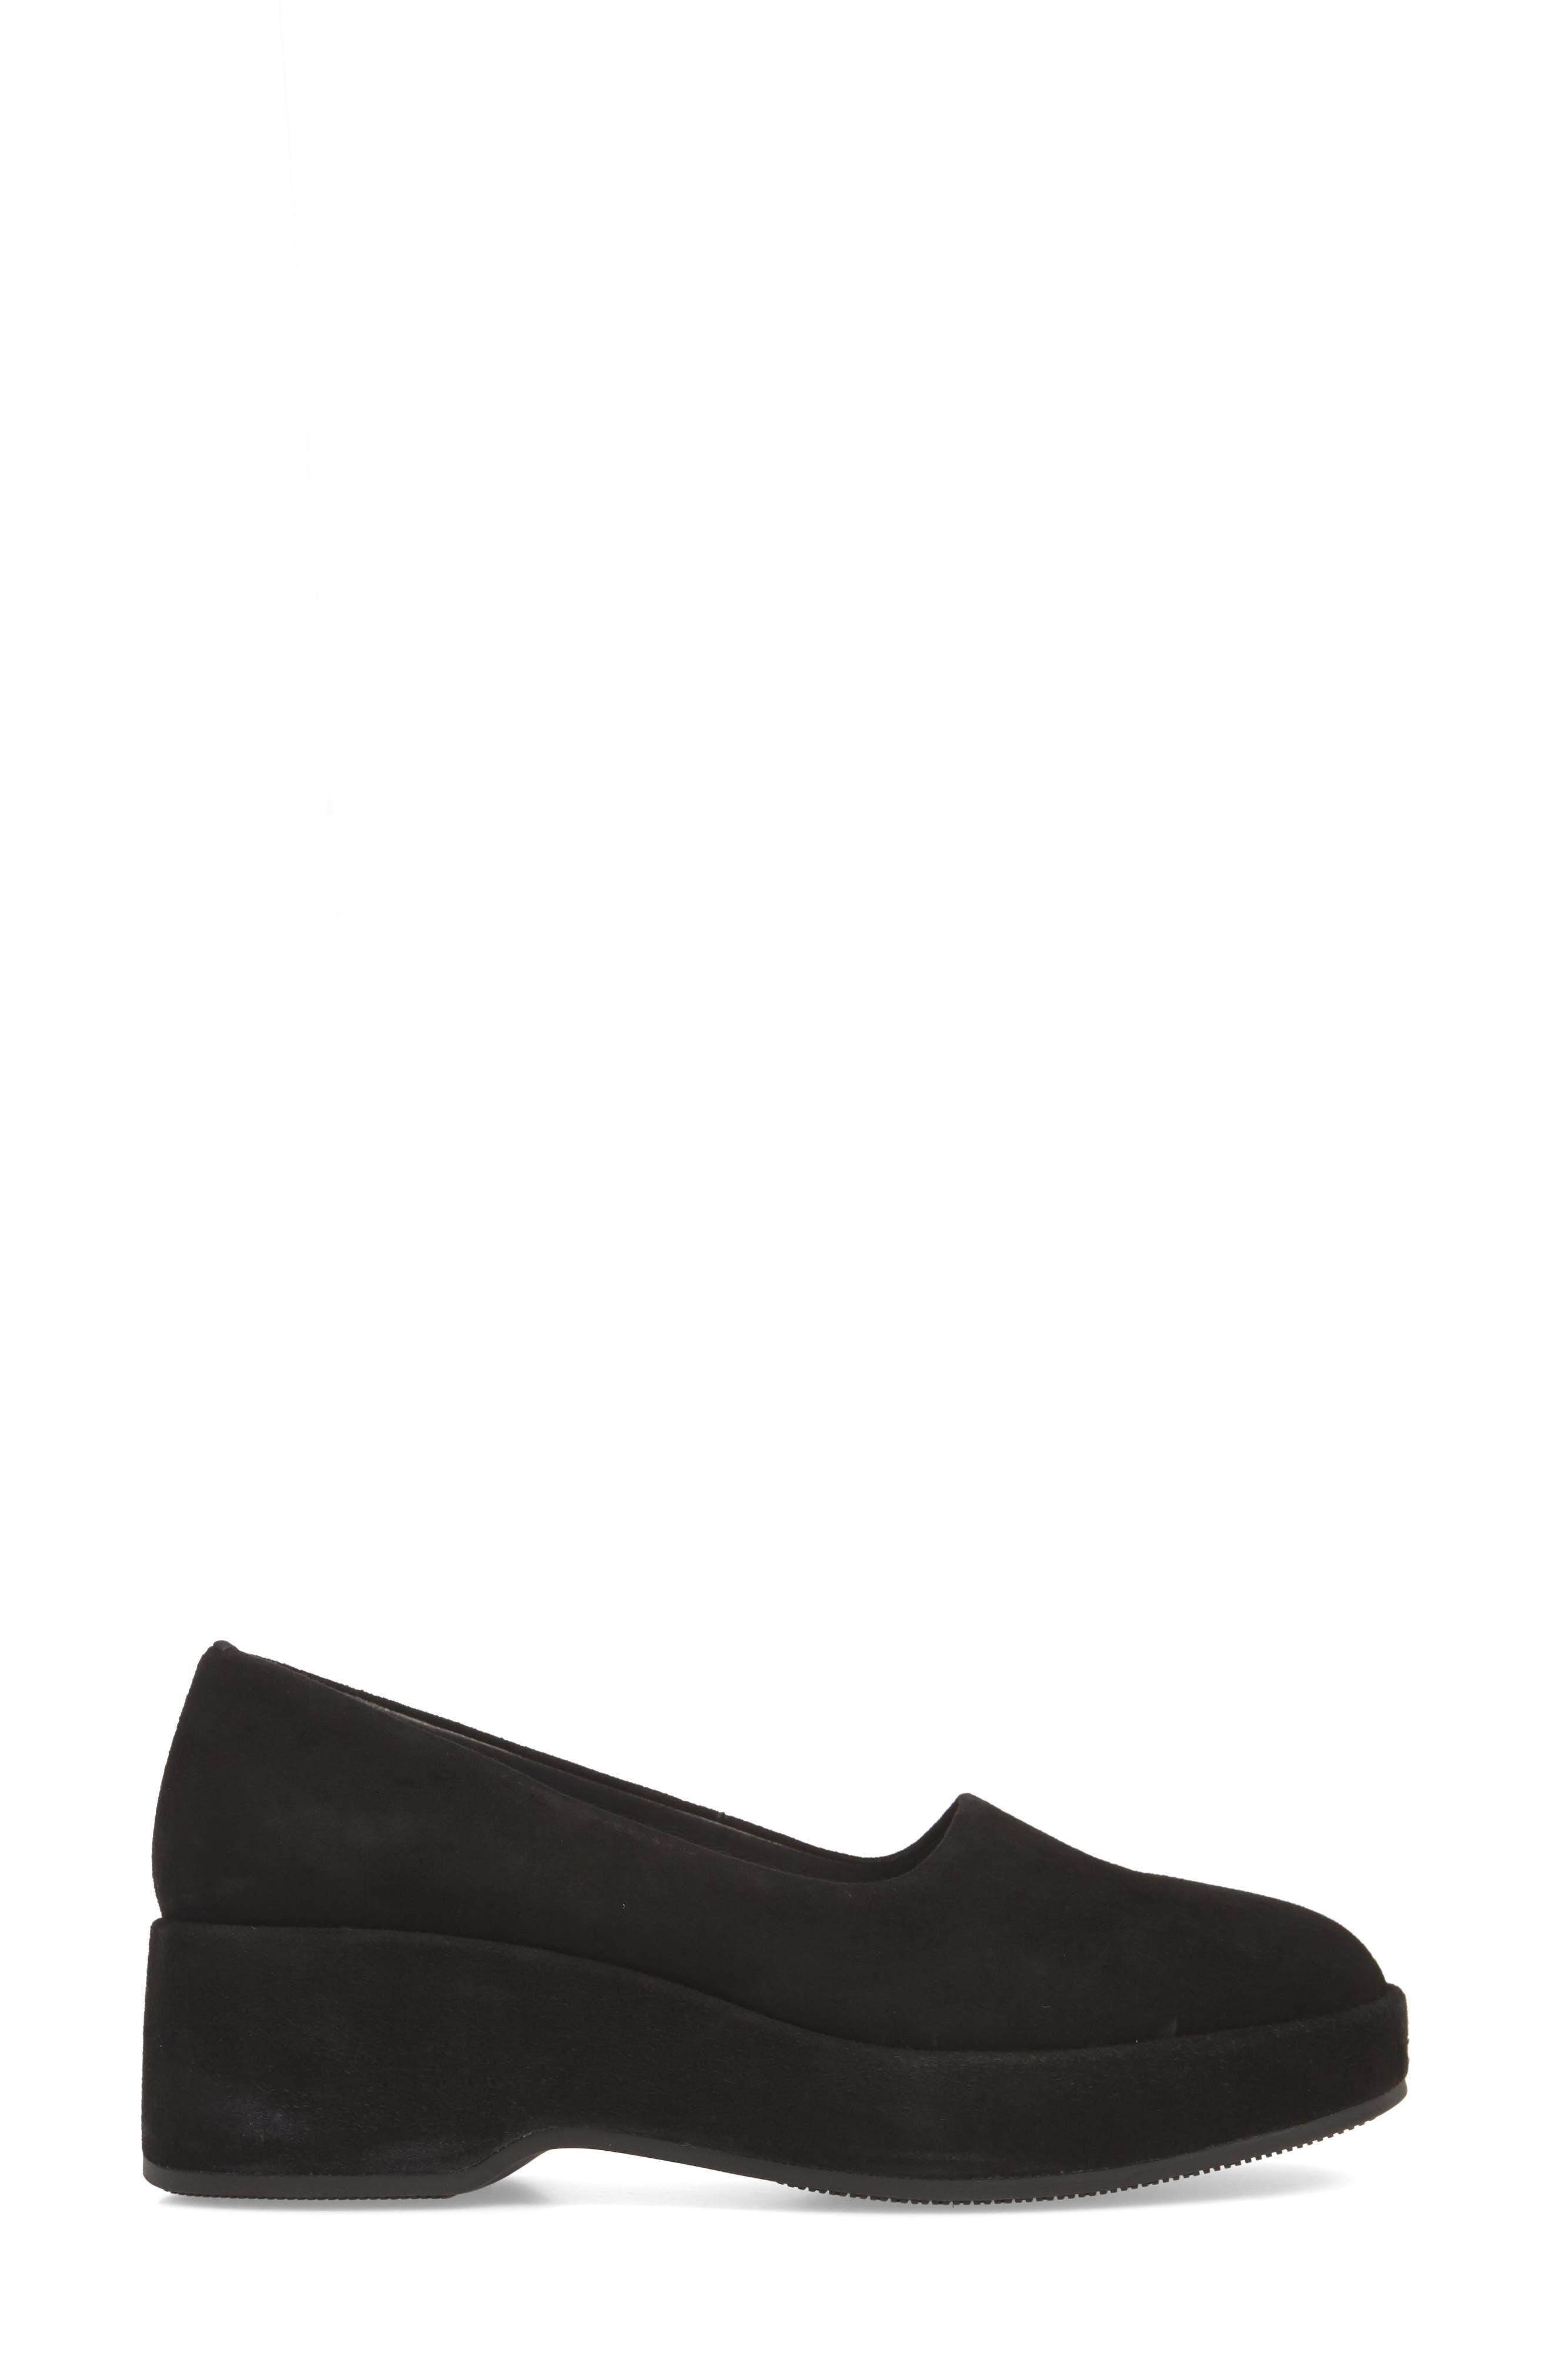 Sisea Platform Shoe,                             Alternate thumbnail 3, color,                             BLACK LEATHER